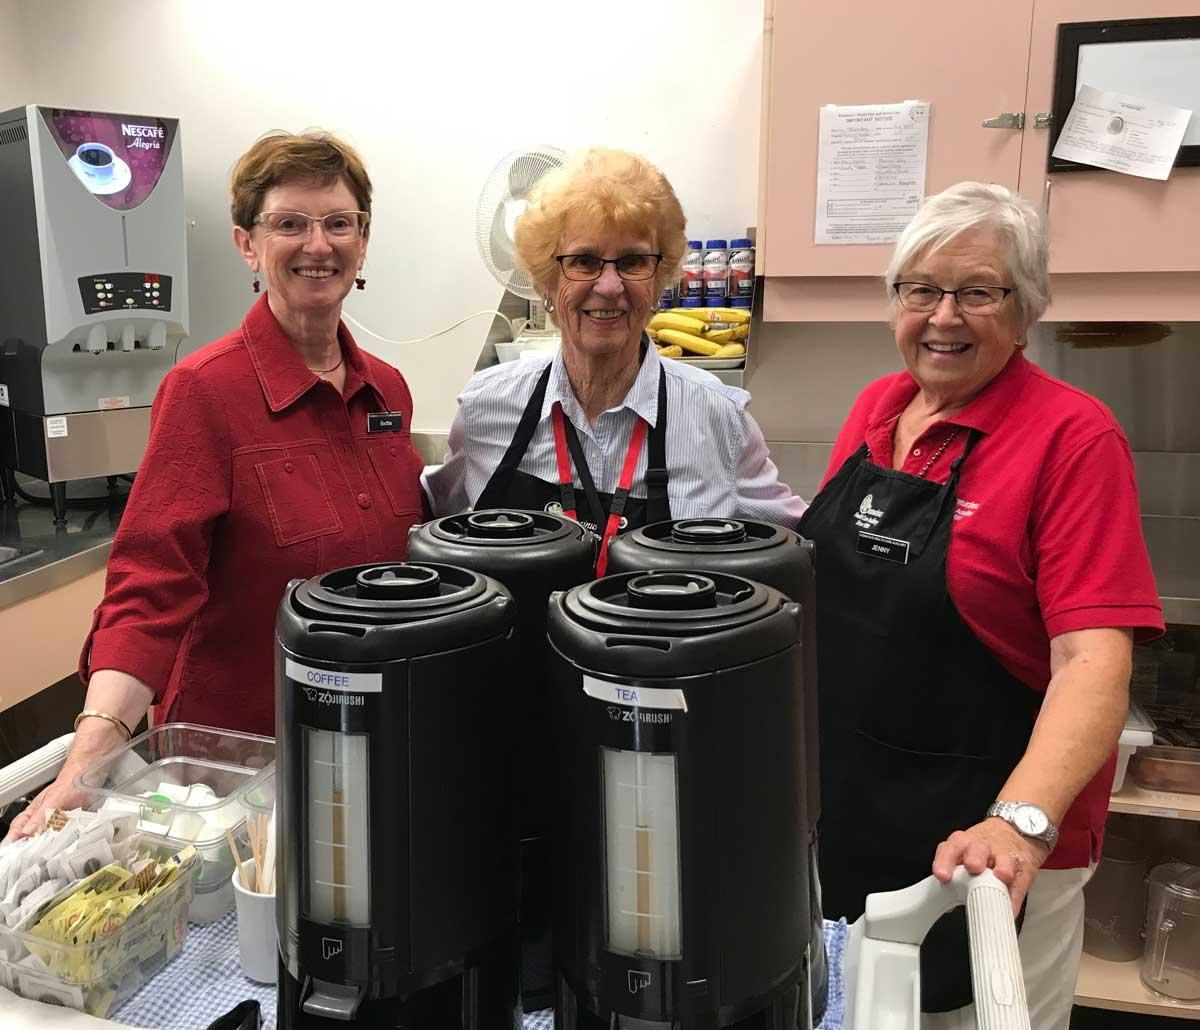 Chemainus Health Care Auxiliary Tea Servers